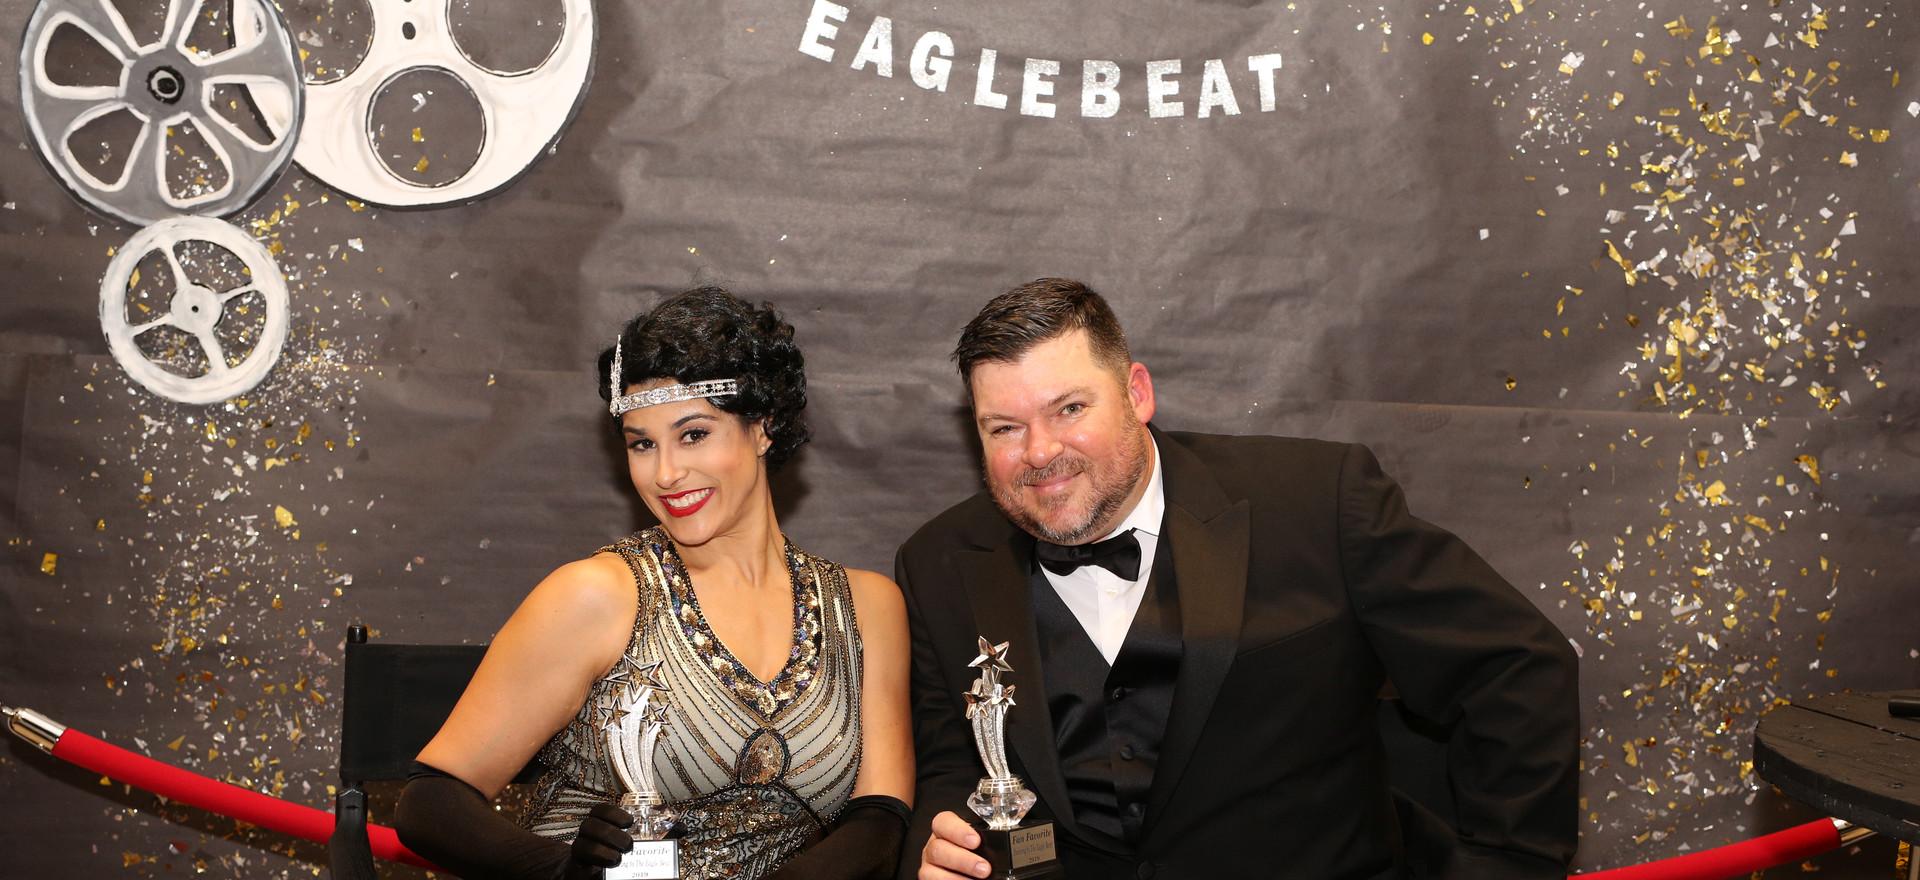 Eagle Beat 2019 (288).JPG